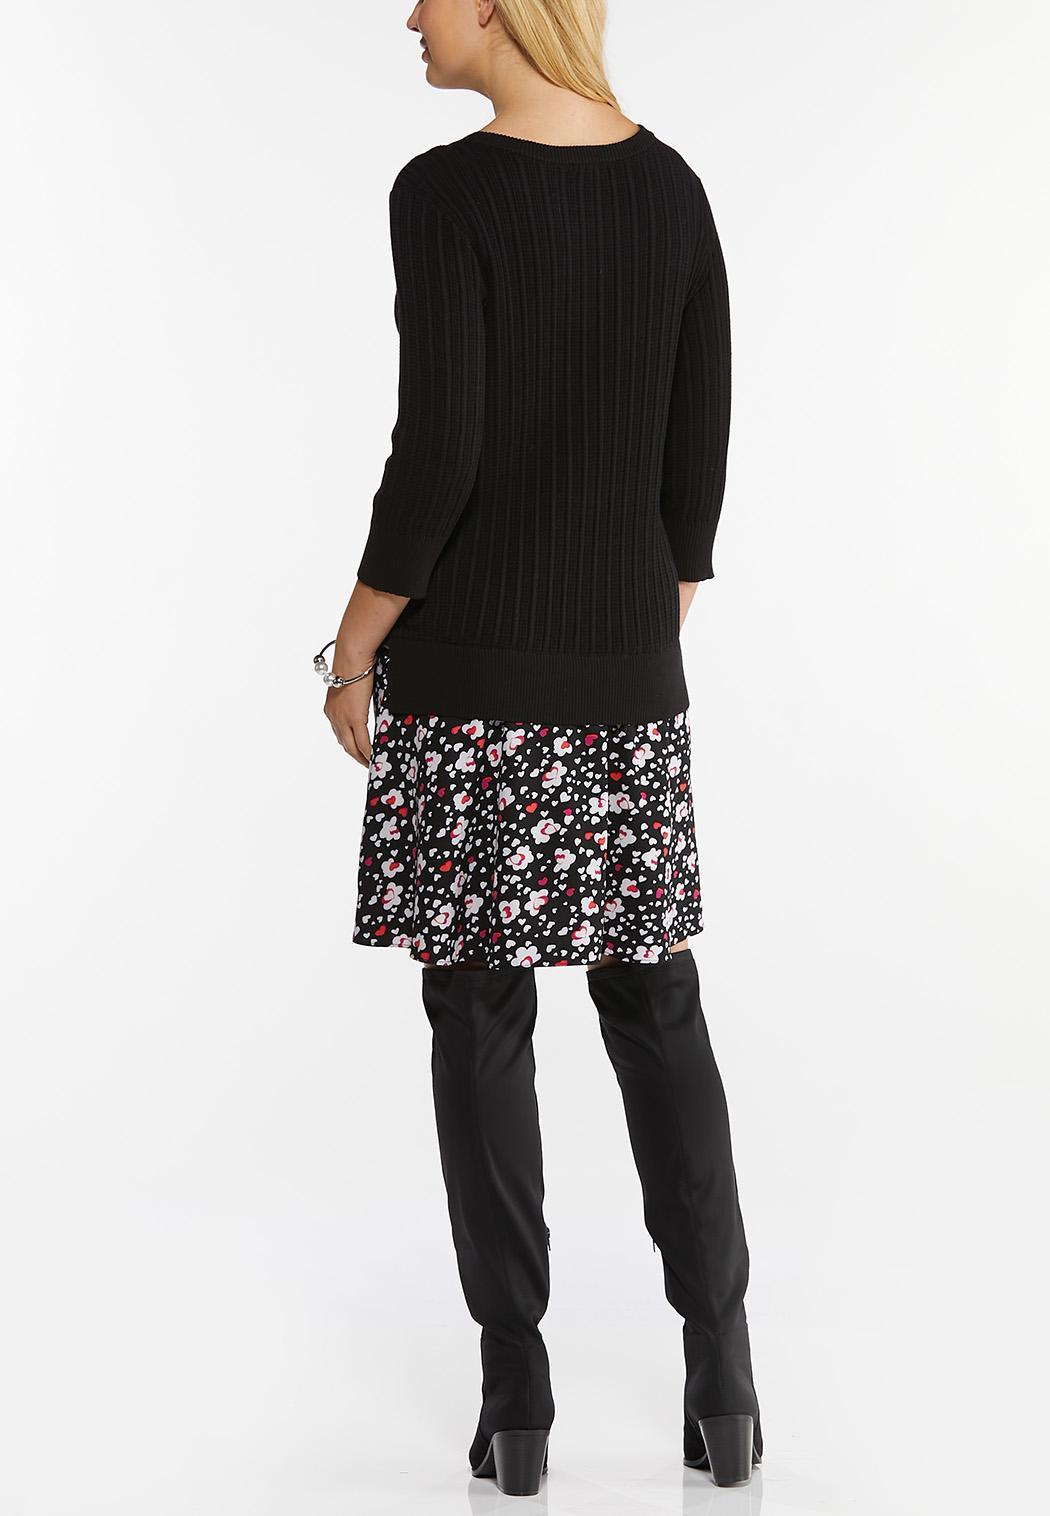 Tunic Sweater And Skirt Set (Item #44428455)